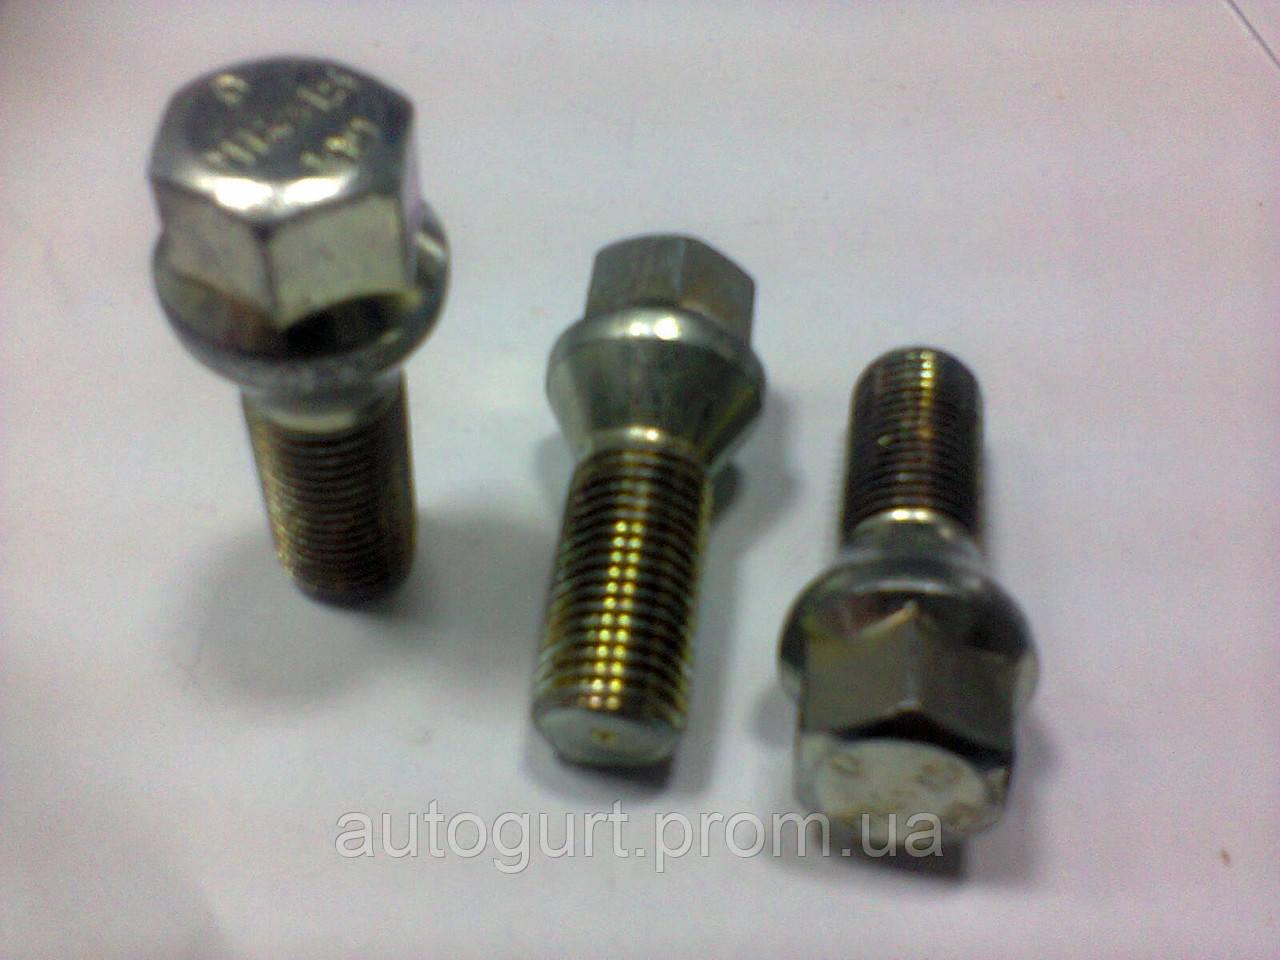 Болт колеса B1769 28mm 10.9 ASS 14x1.5x28 RH тит./хром 10.9 ASS (Audi, VW, Skoda)